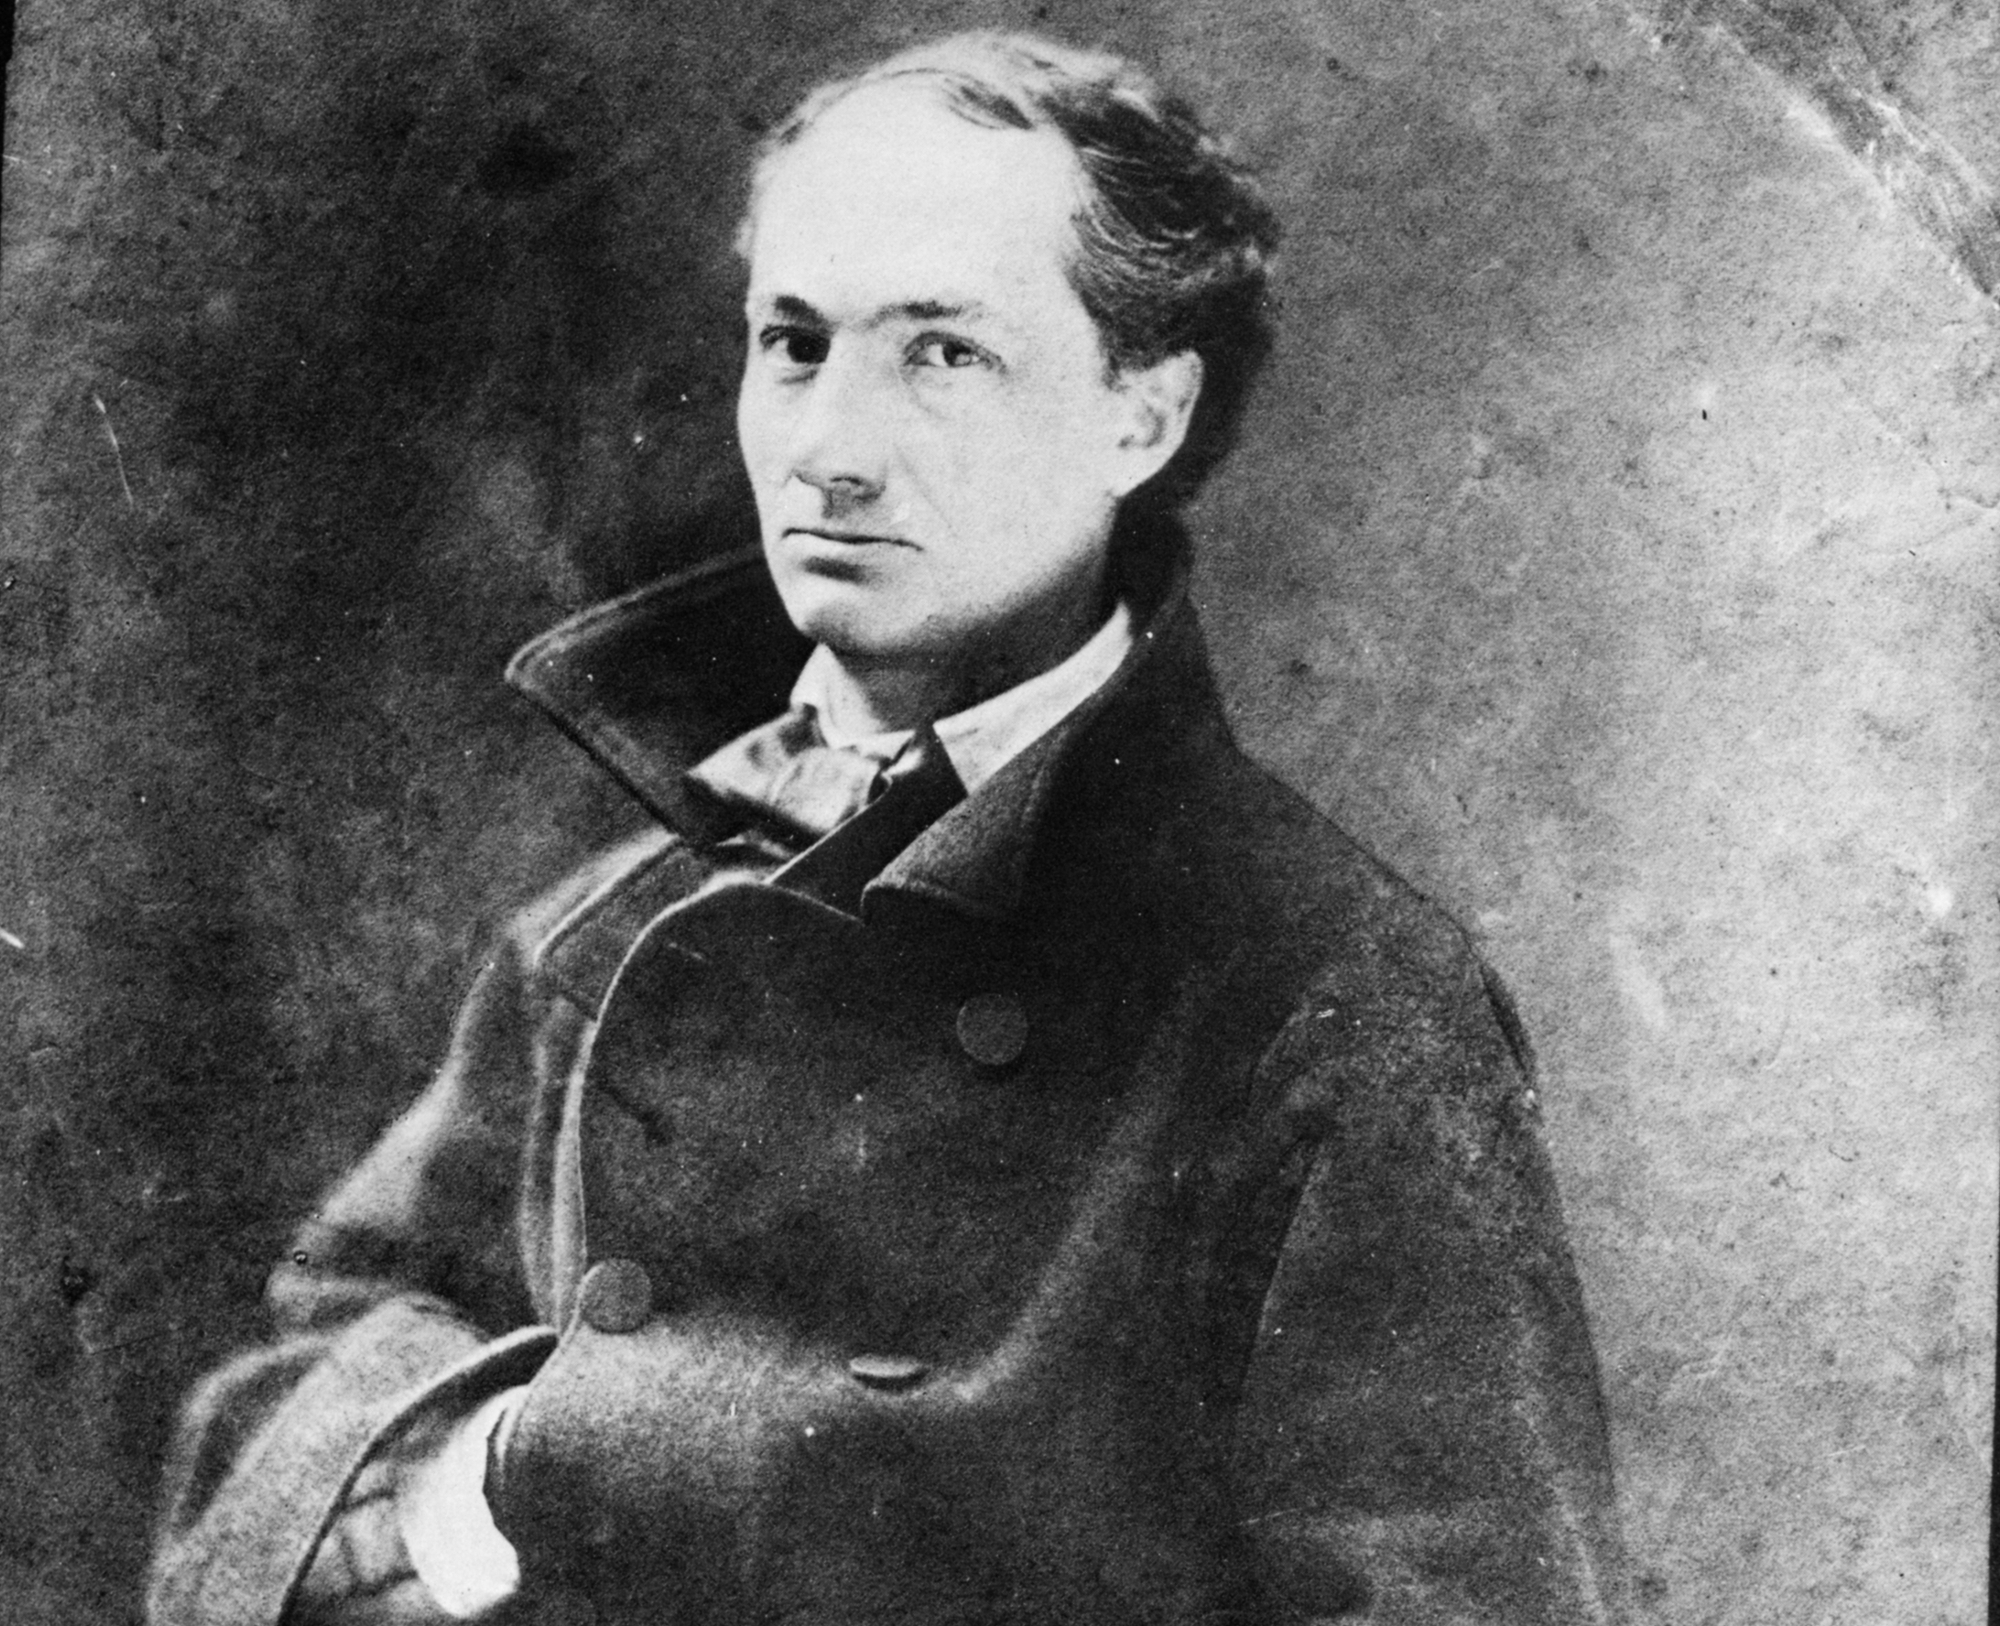 Молодой Бодлер (1855). Фотограф: Félix Nadar. Источник: commons.wikimedia.org